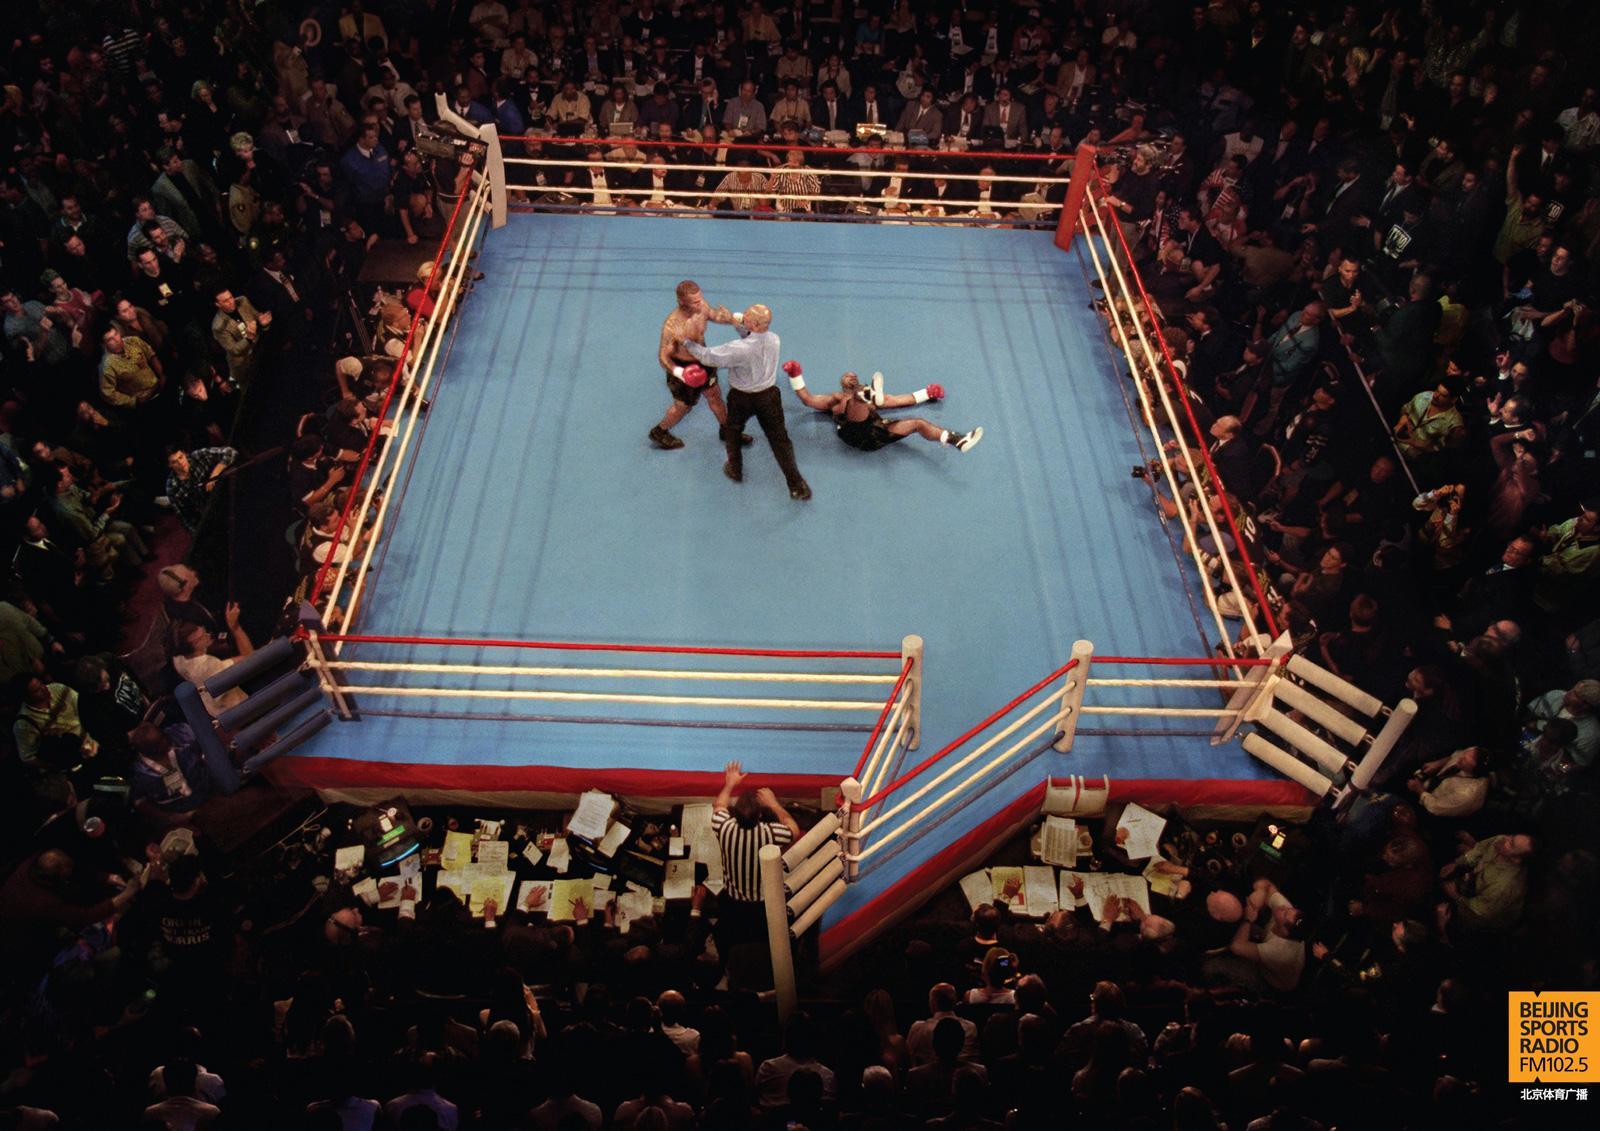 Beijing Sports Radio: Boxing   Ads of the World™